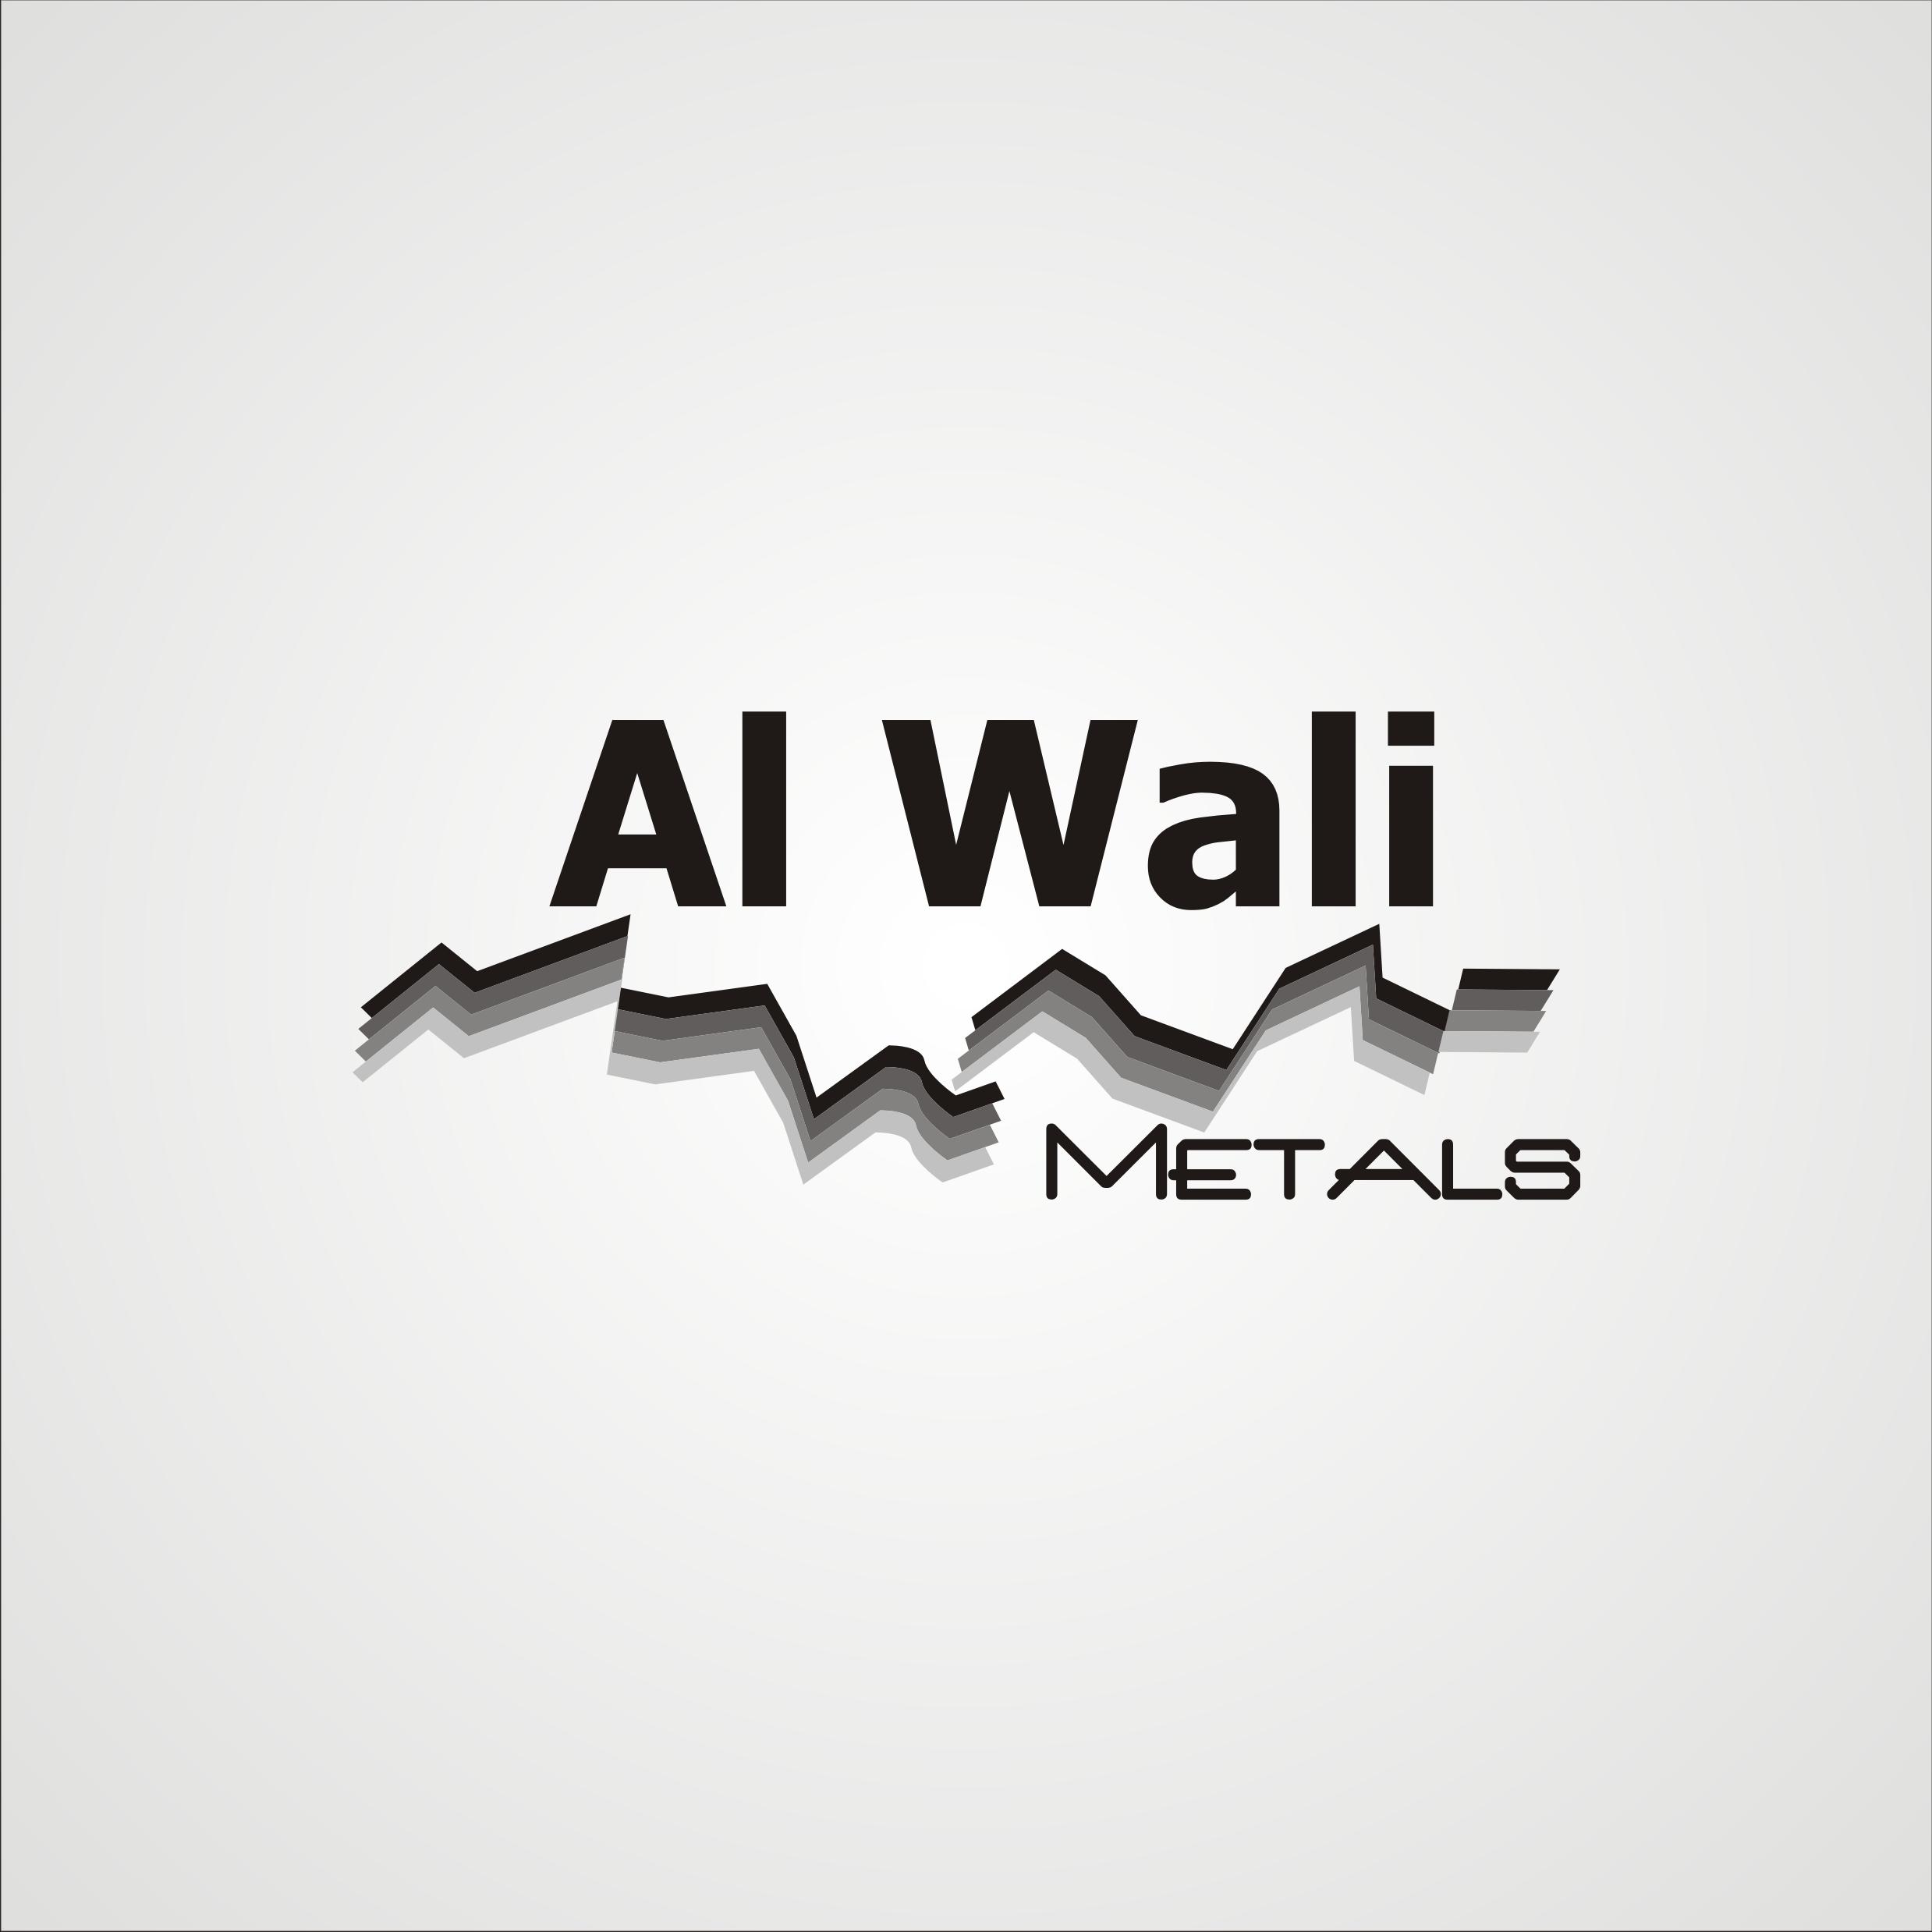 Logo Design by Private User - Entry No. 117 in the Logo Design Contest Inspiring Logo Design for Al Wali Metals.